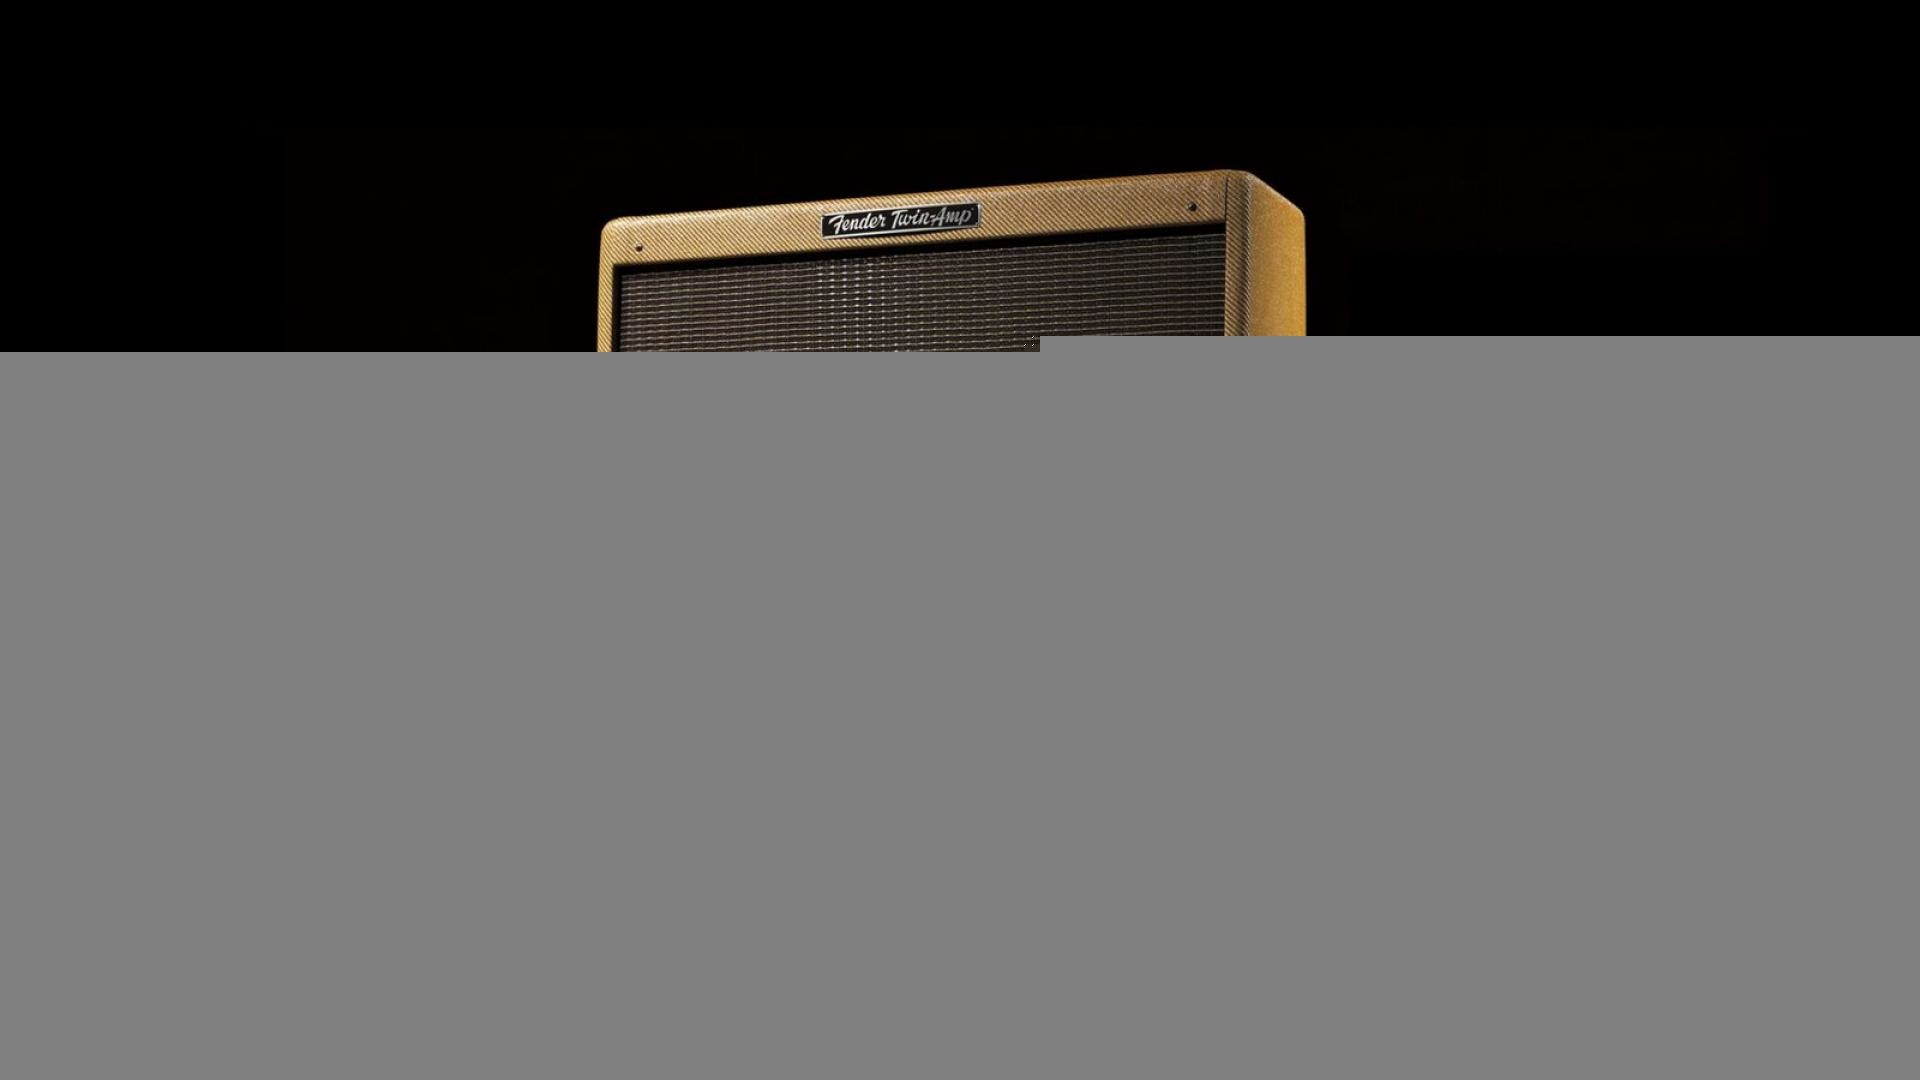 HD Telecaster Fender Guitars Hq Wallpaper